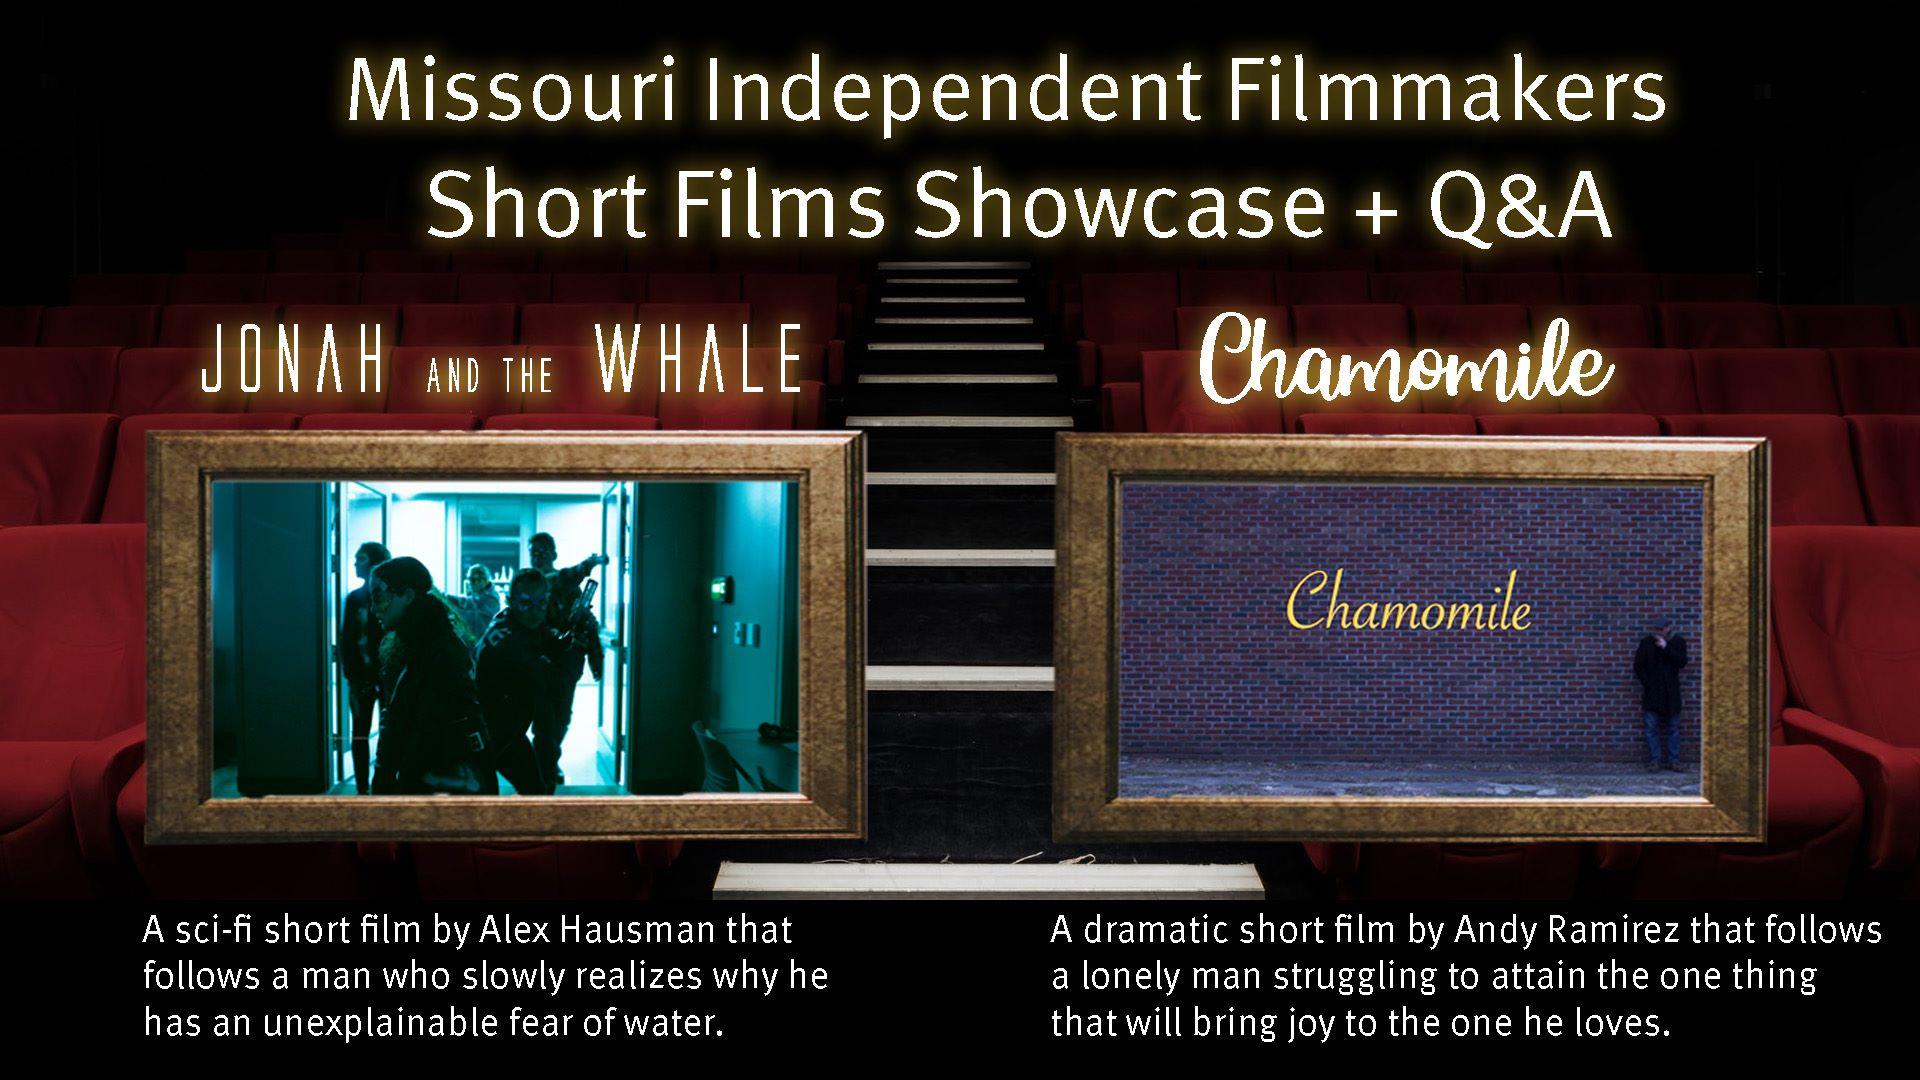 missouri-independent-filmmaker-showcase-short-film-filmmaking-jefferson-city-capitol-cinema-thursday-night-live